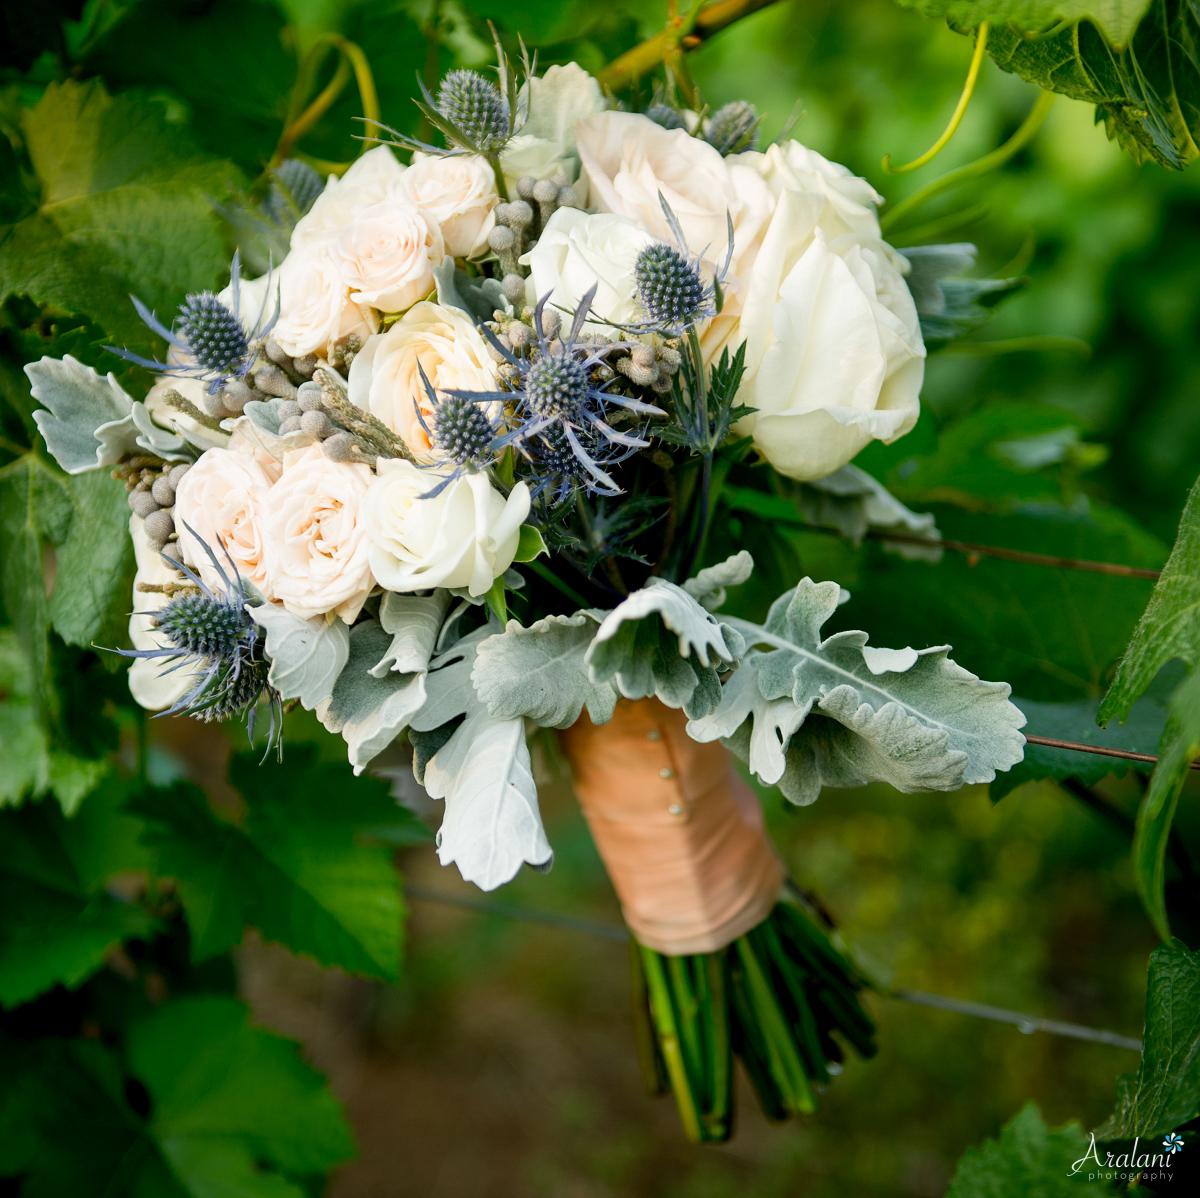 Alloro_Vinyard_Wedding0026.jpg